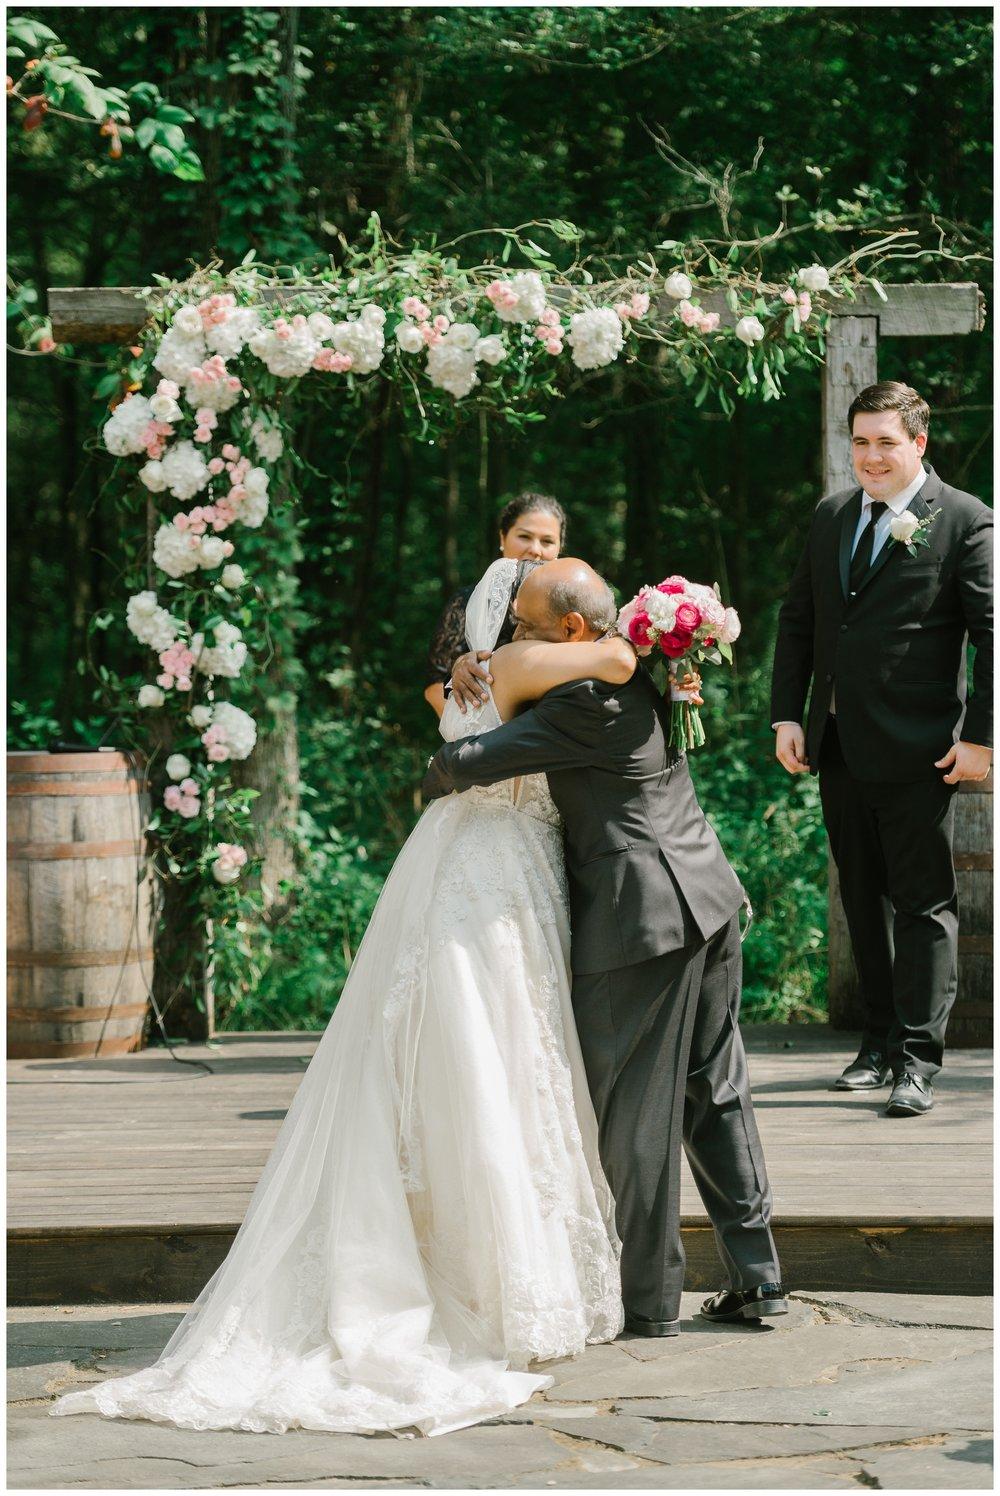 Rebecca_Bridges_Photography_Indianapolis_Wedding_Photographer_6941.jpg